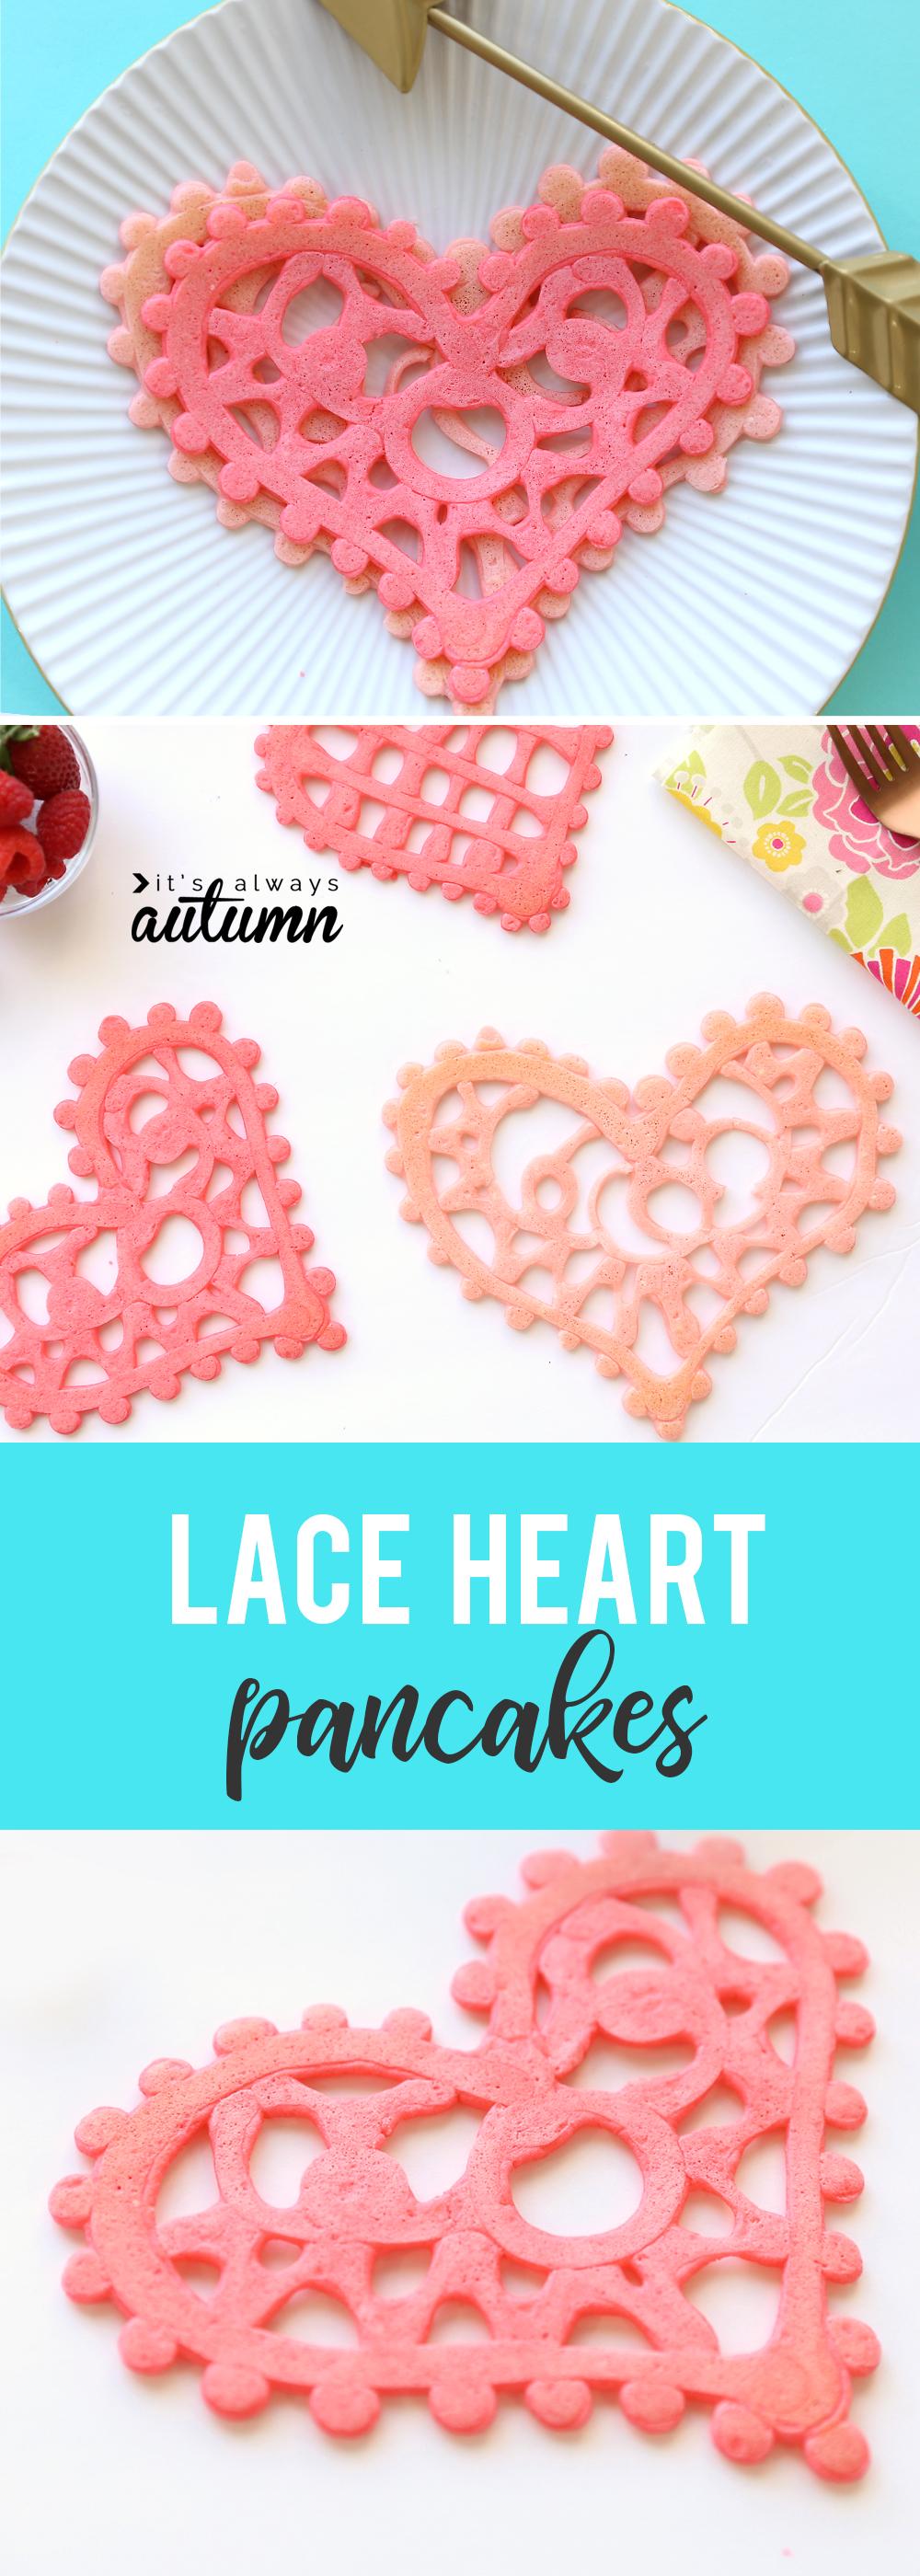 Lace heart pancakes